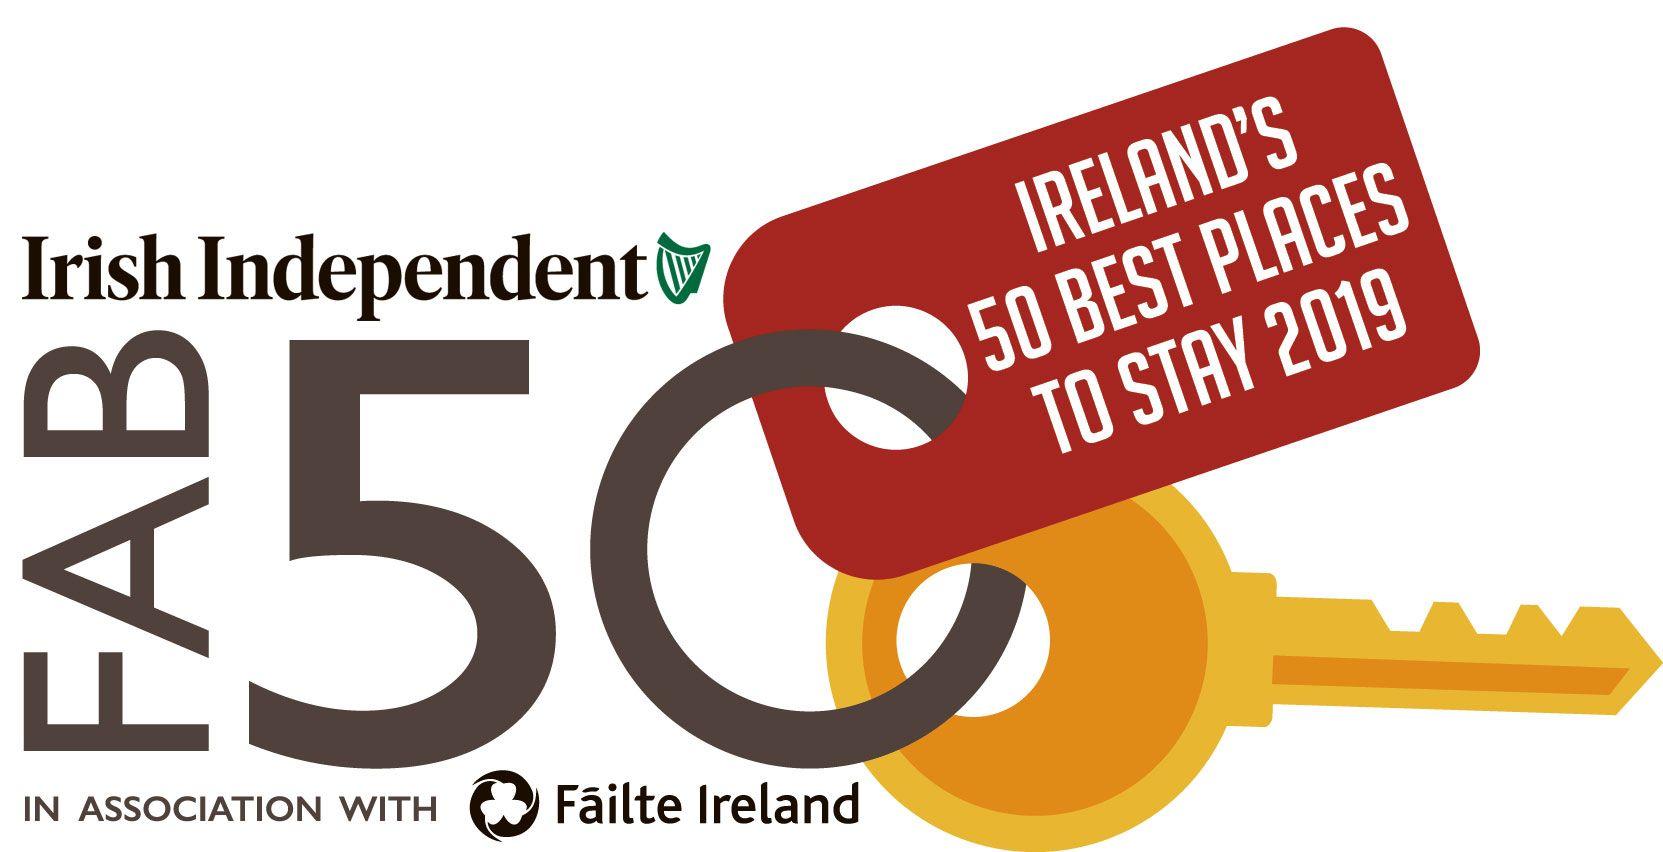 Cork Nightlife for a mid 30s - Cork Forum - Tripadvisor